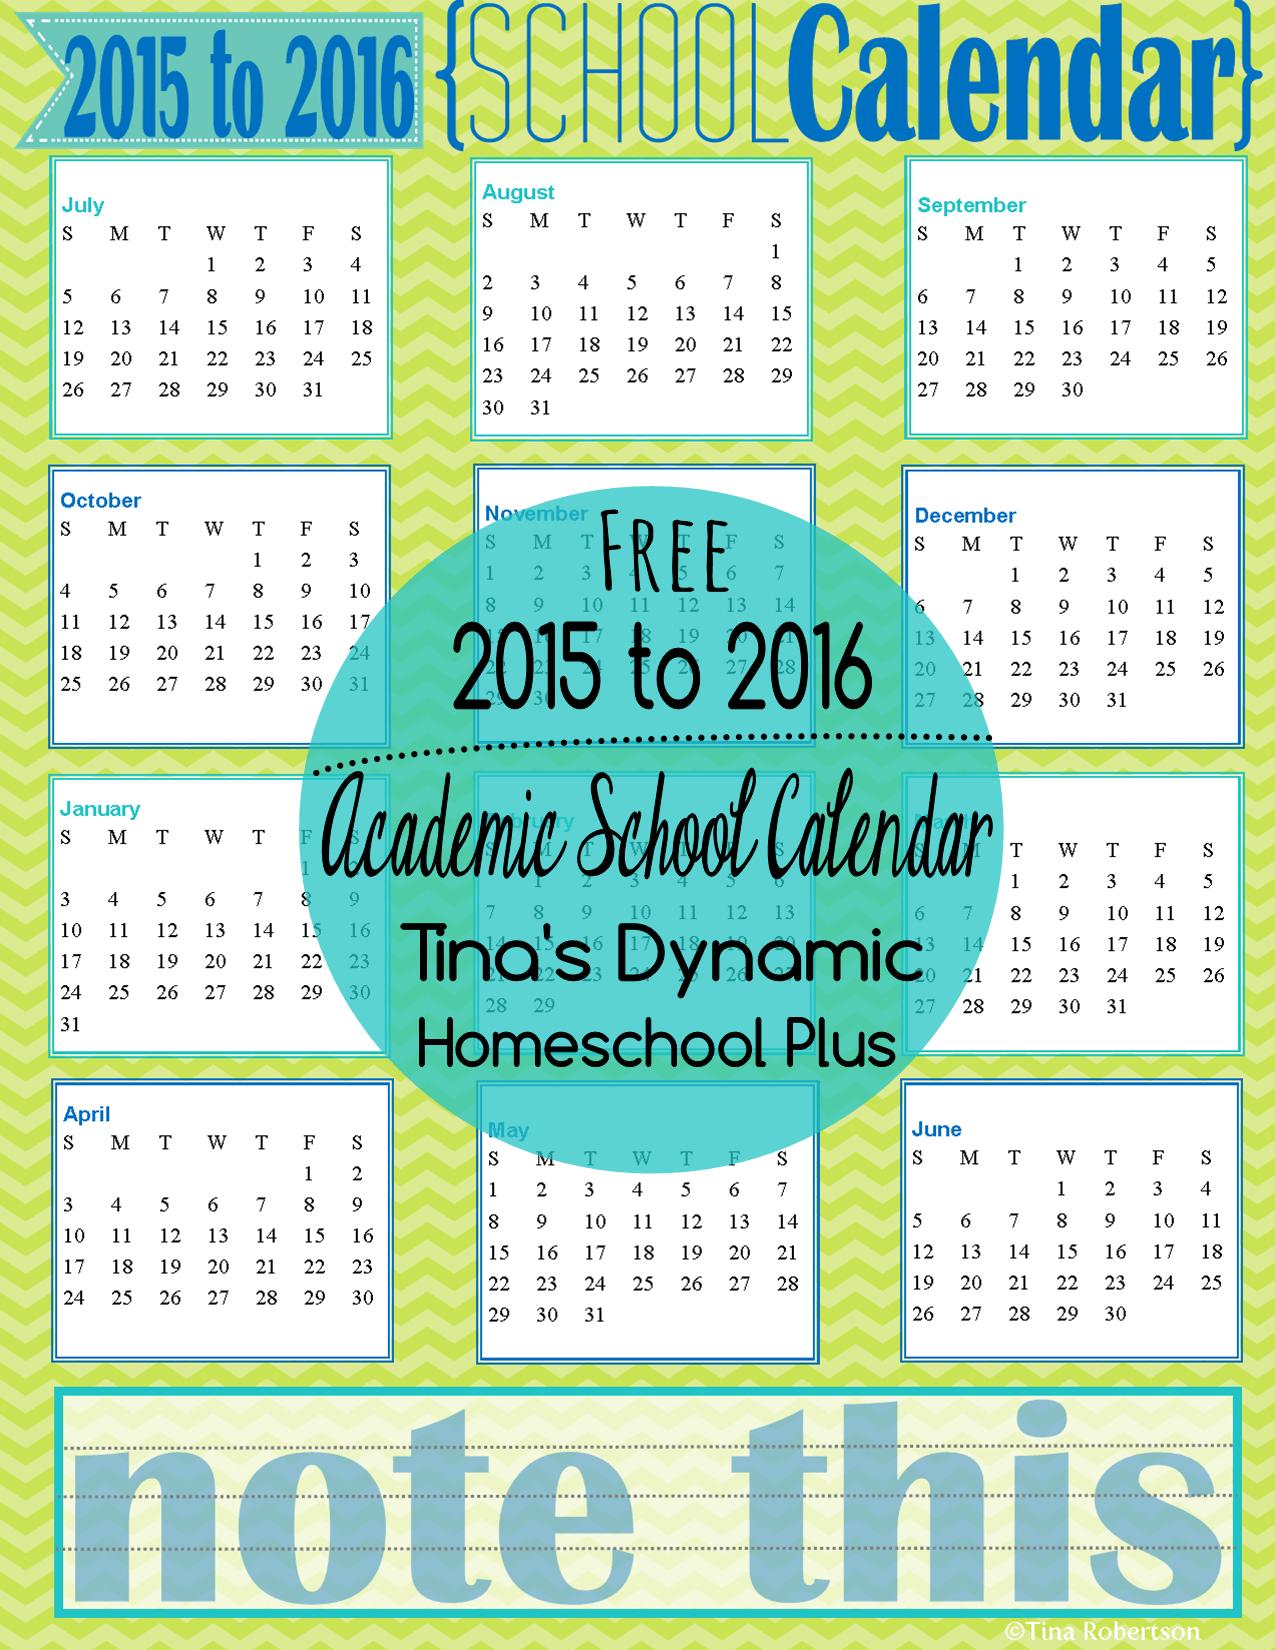 Free Academic School Calendar 2015 2016 Pinterest School